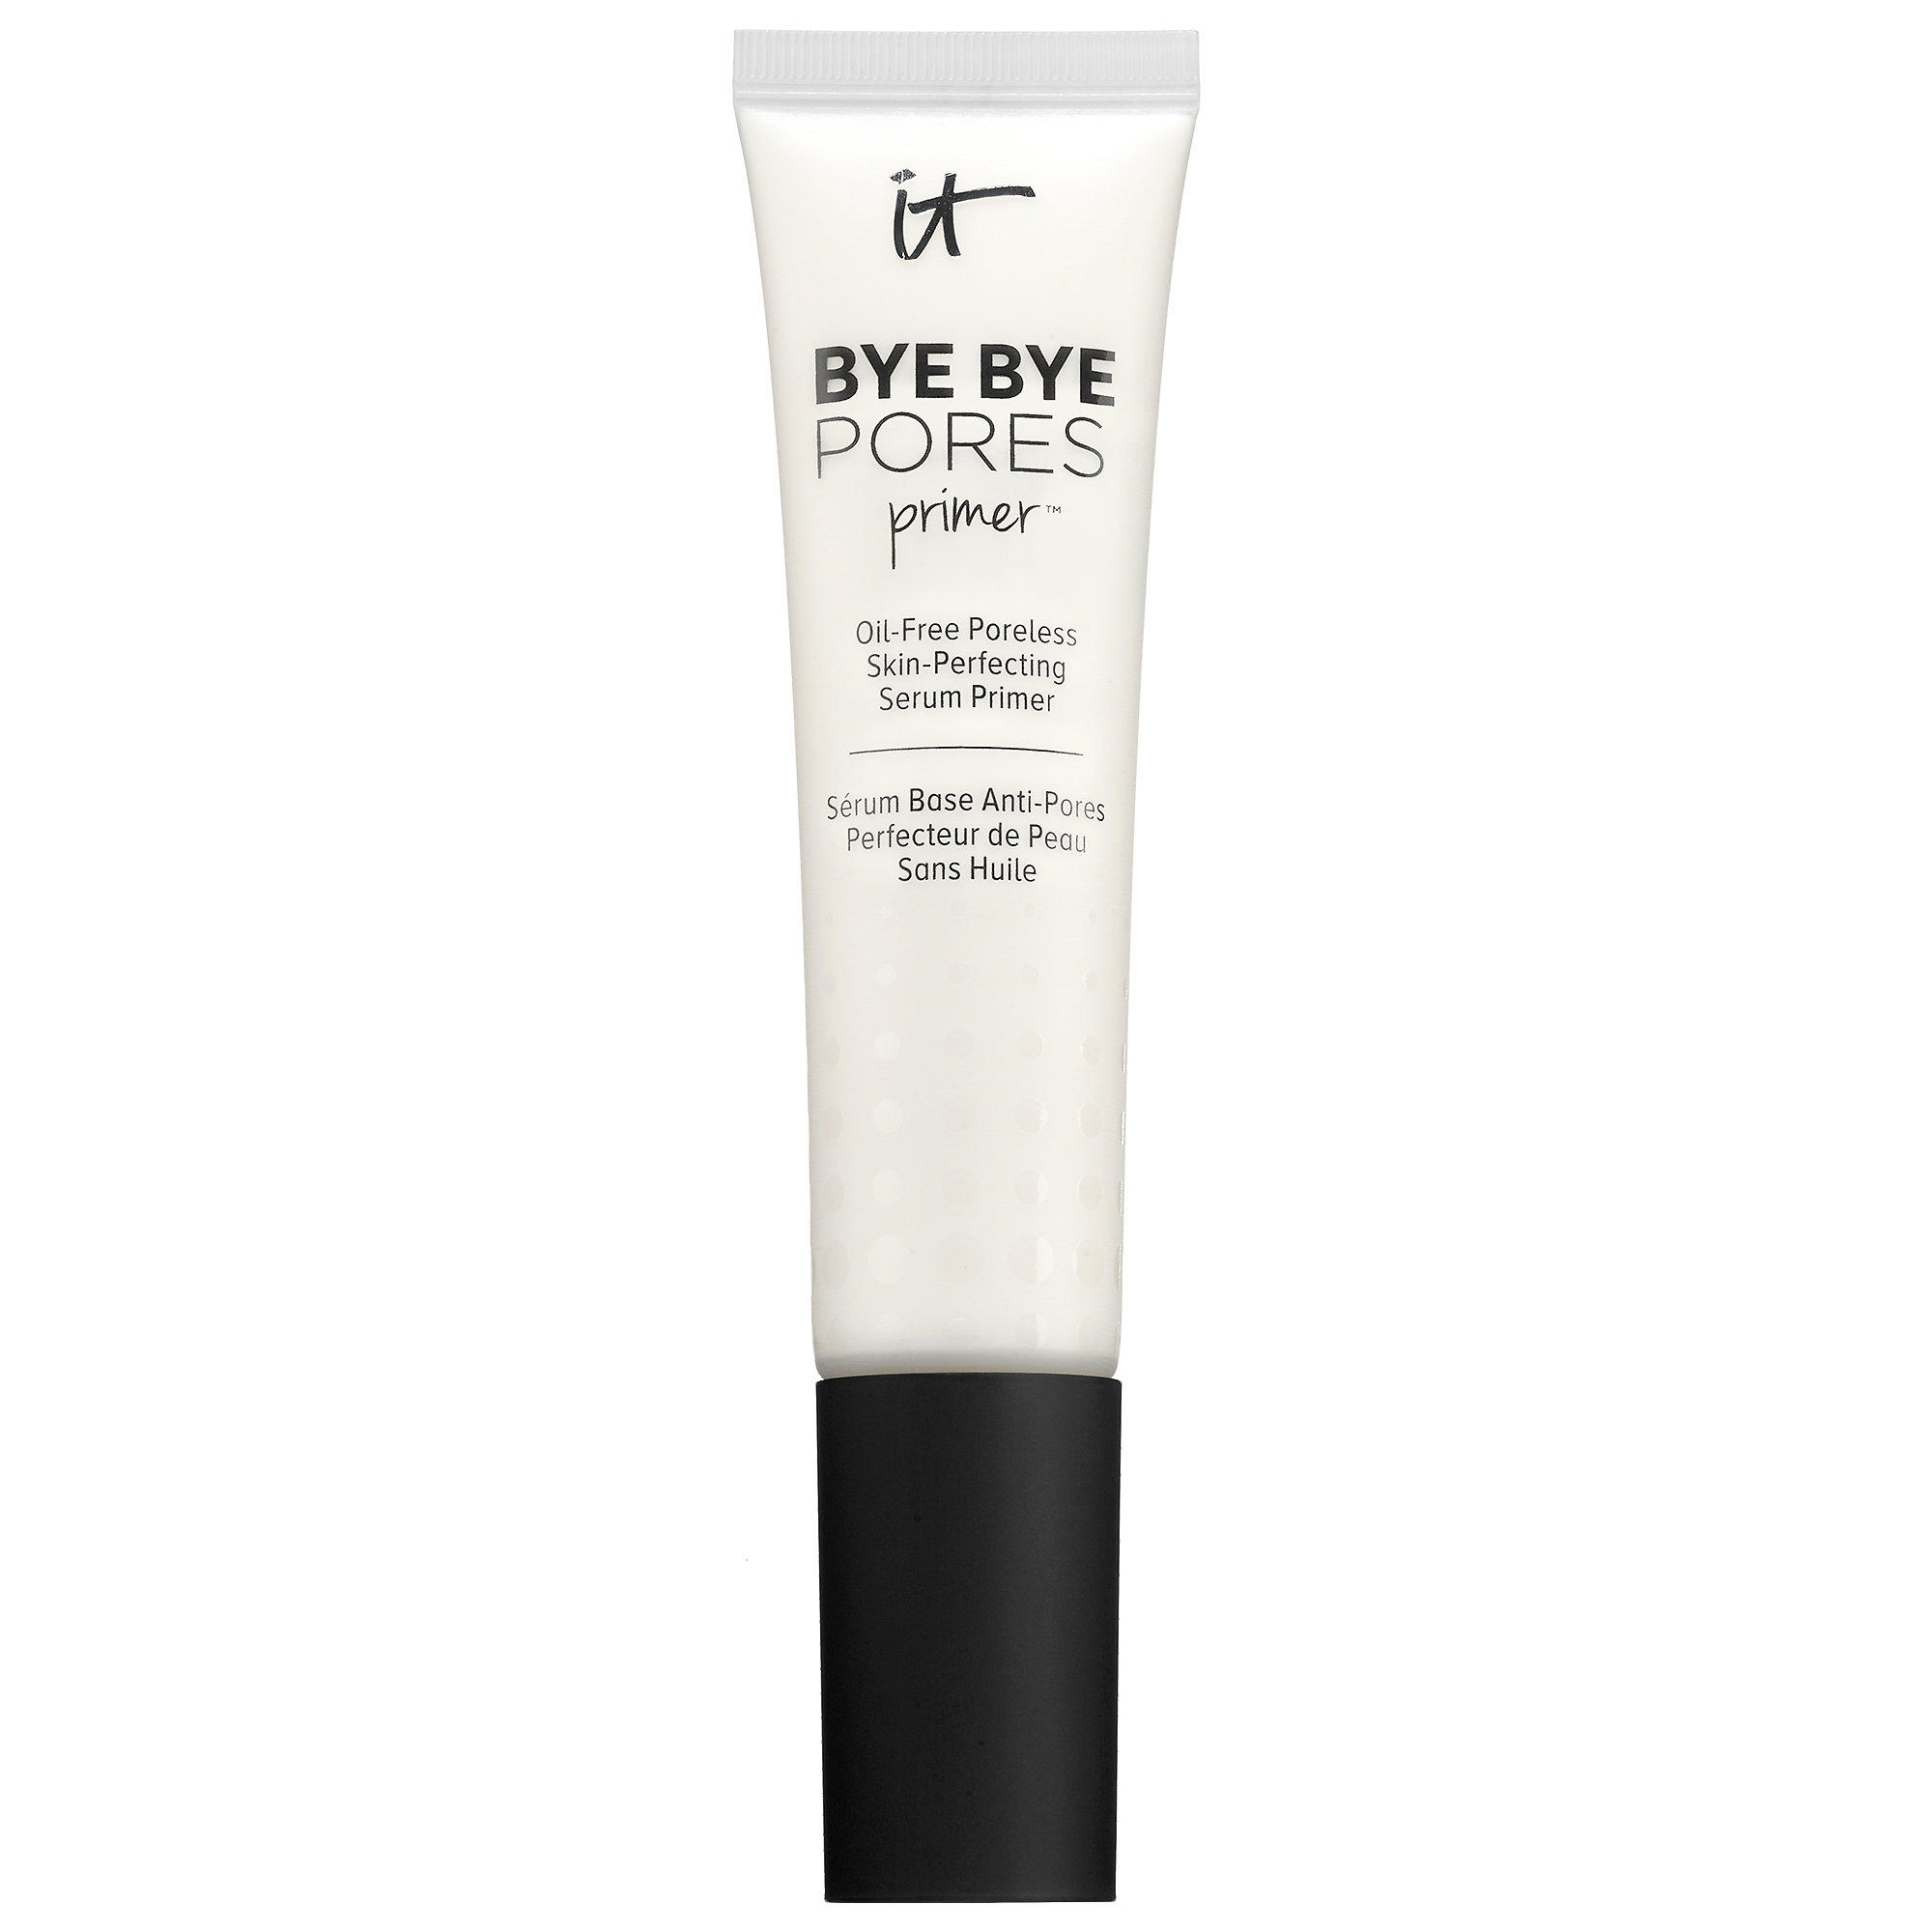 IT Cosmetics Bye Bye Pores Oil-Free Poreless Skin-Perfecting Serum Primer